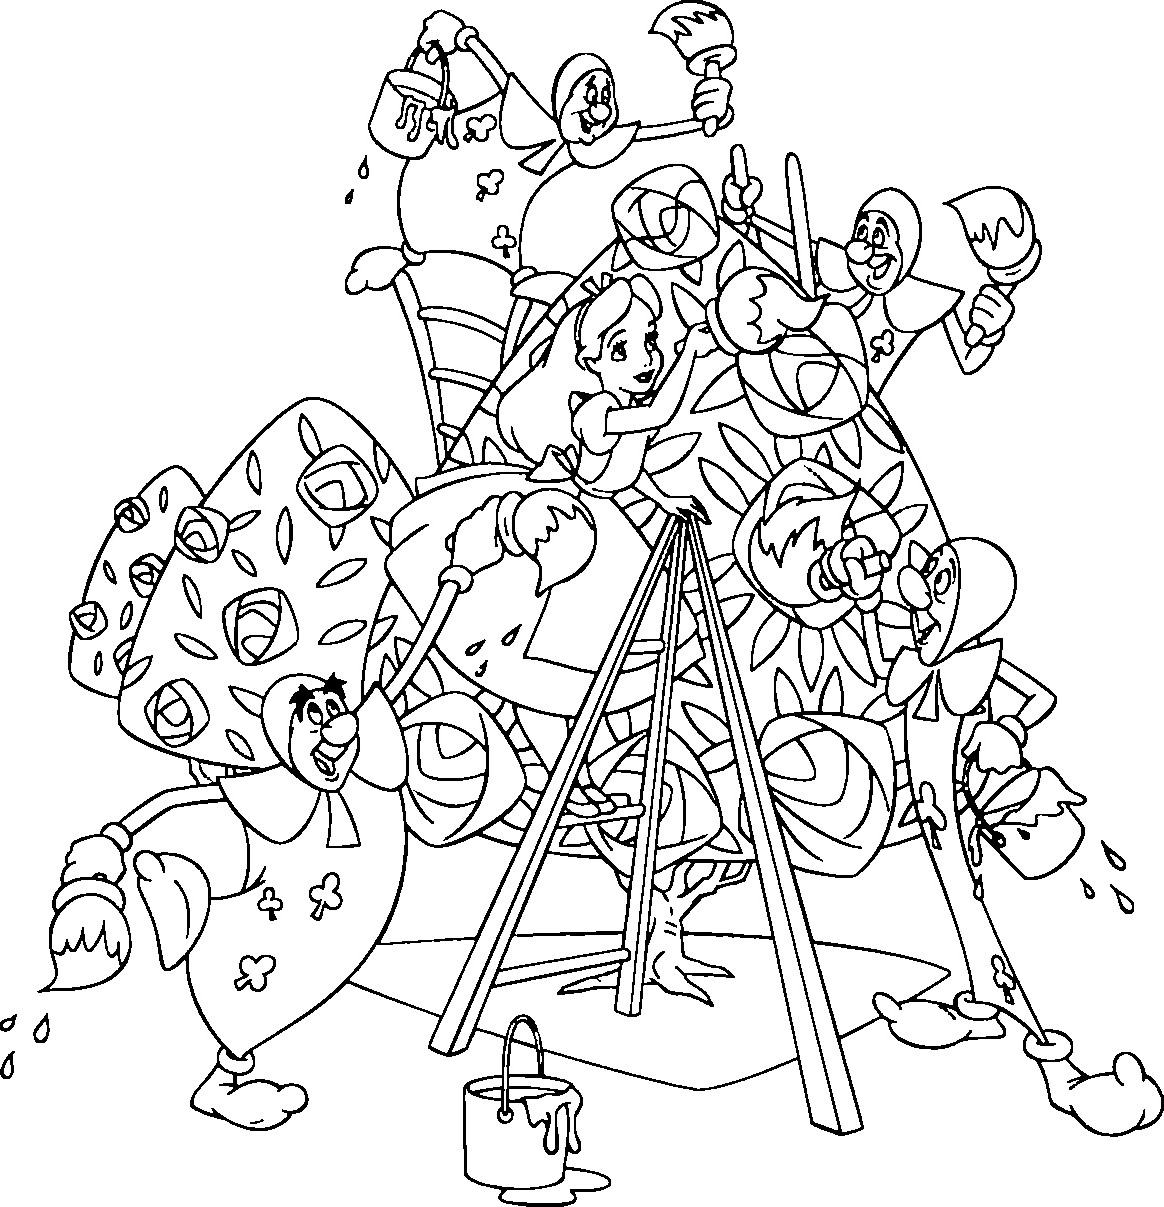 1164x1207 Printable Alice In Wonderland Coloring Pages Alice In Wonderland